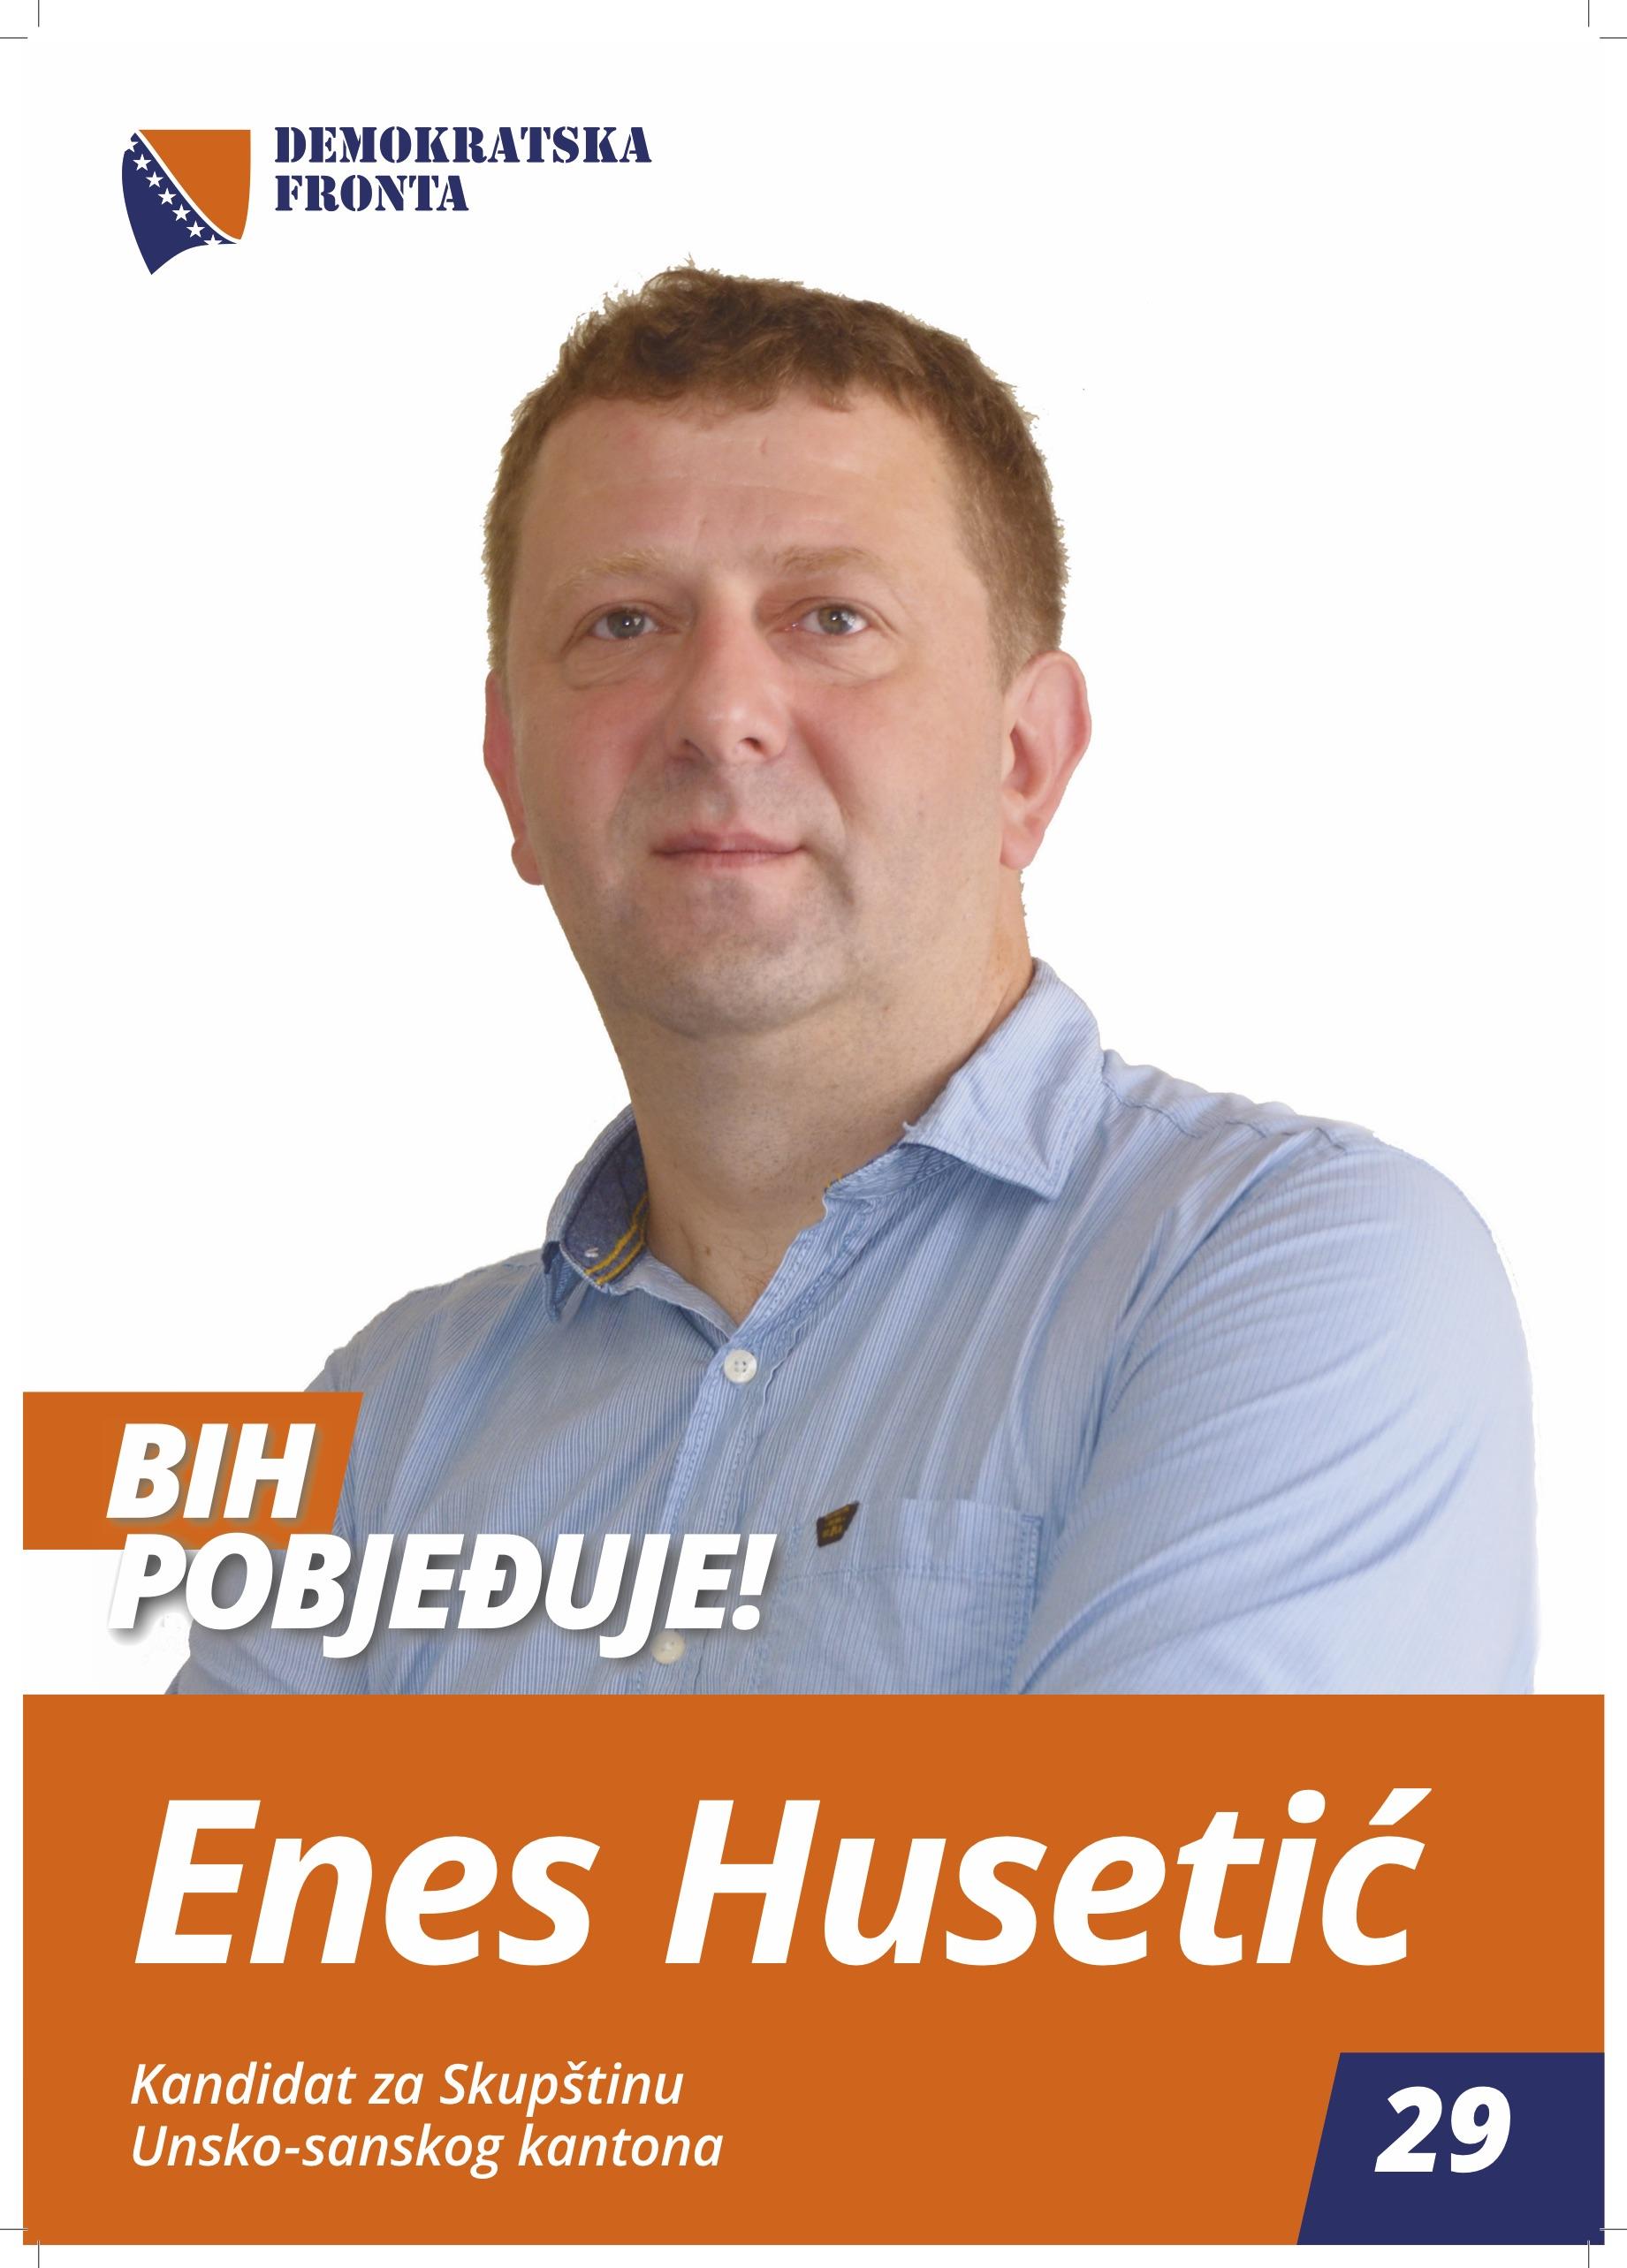 Enes Husetić, profesor njemačkog jezika